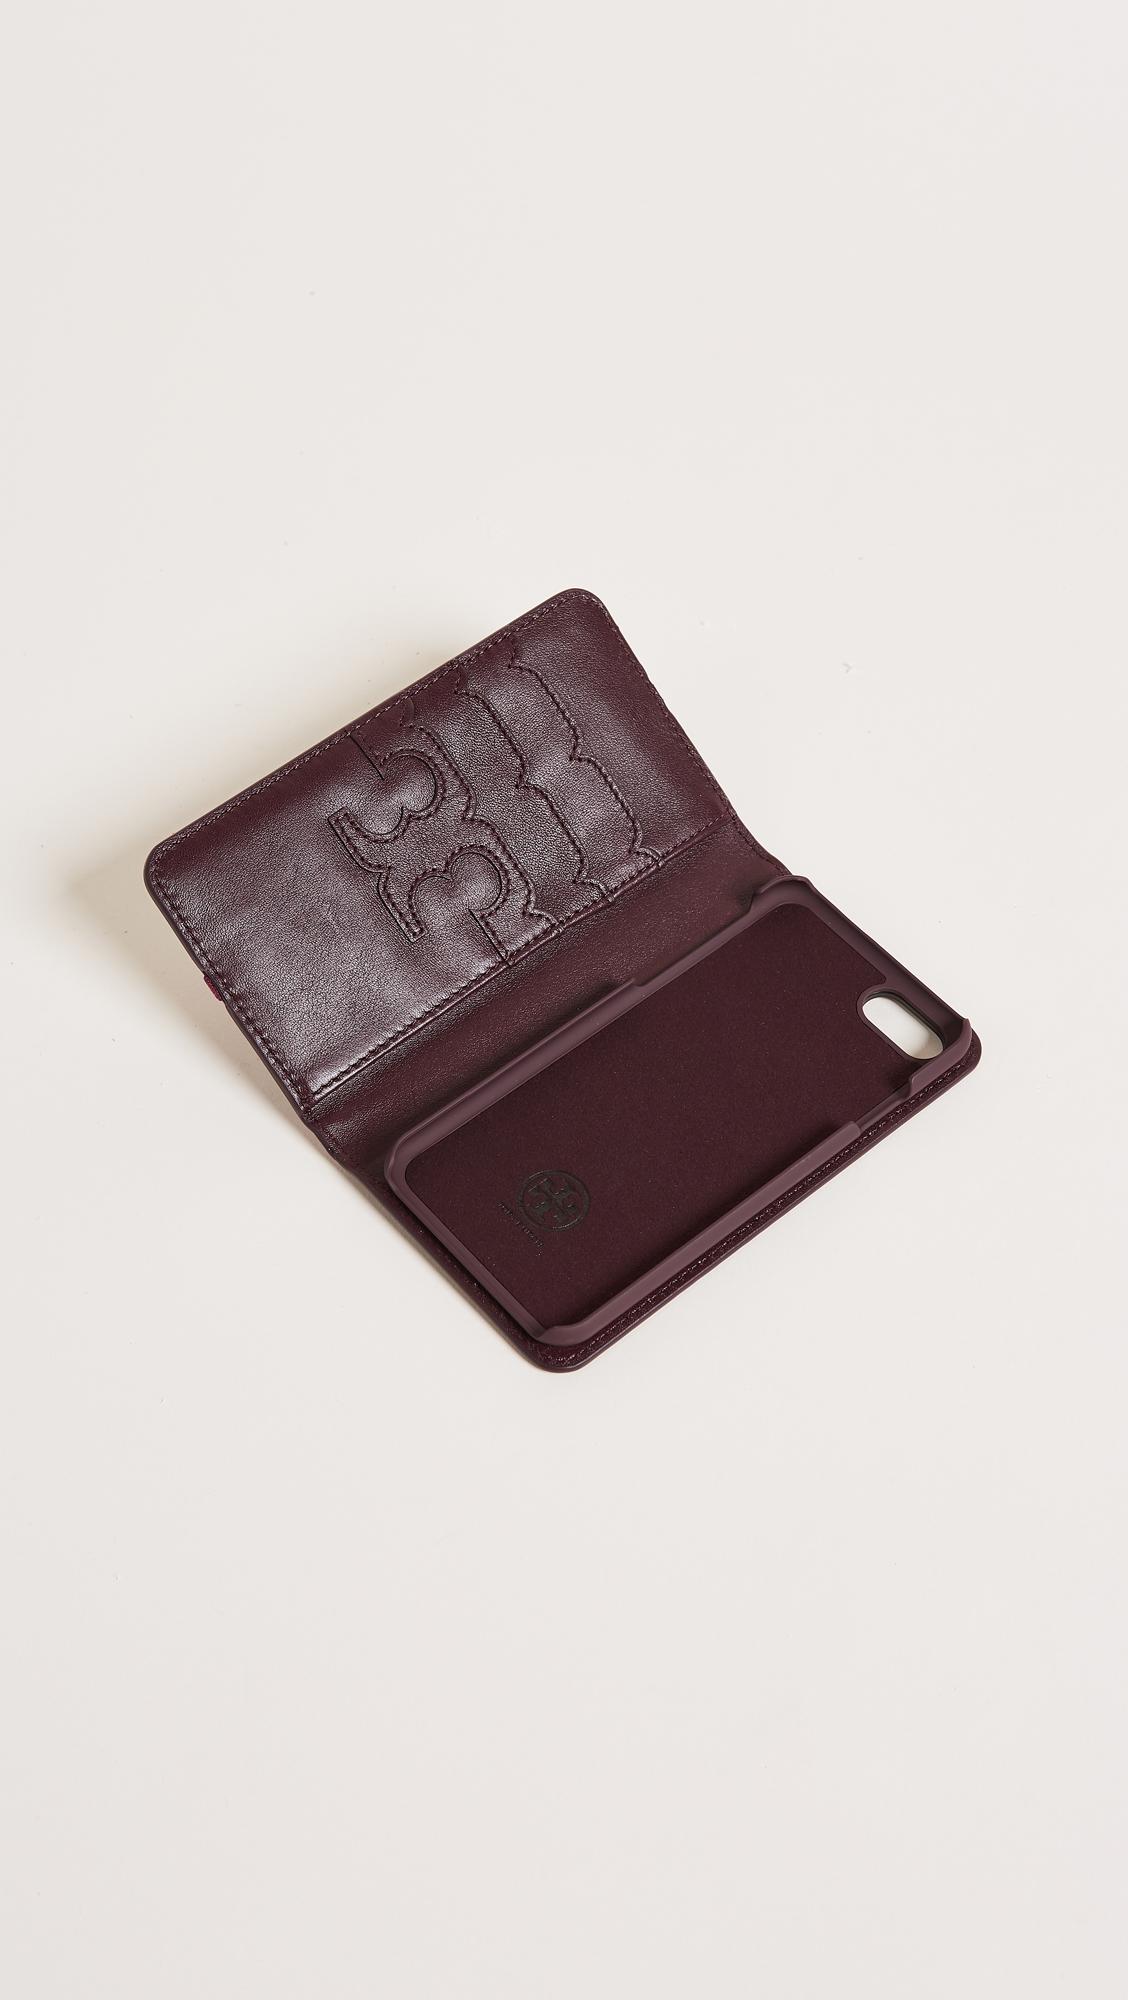 detailed look 1e43f c106a Tory Burch Parker Croc Folio iPhone 7 / 8 Case | SHOPBOP